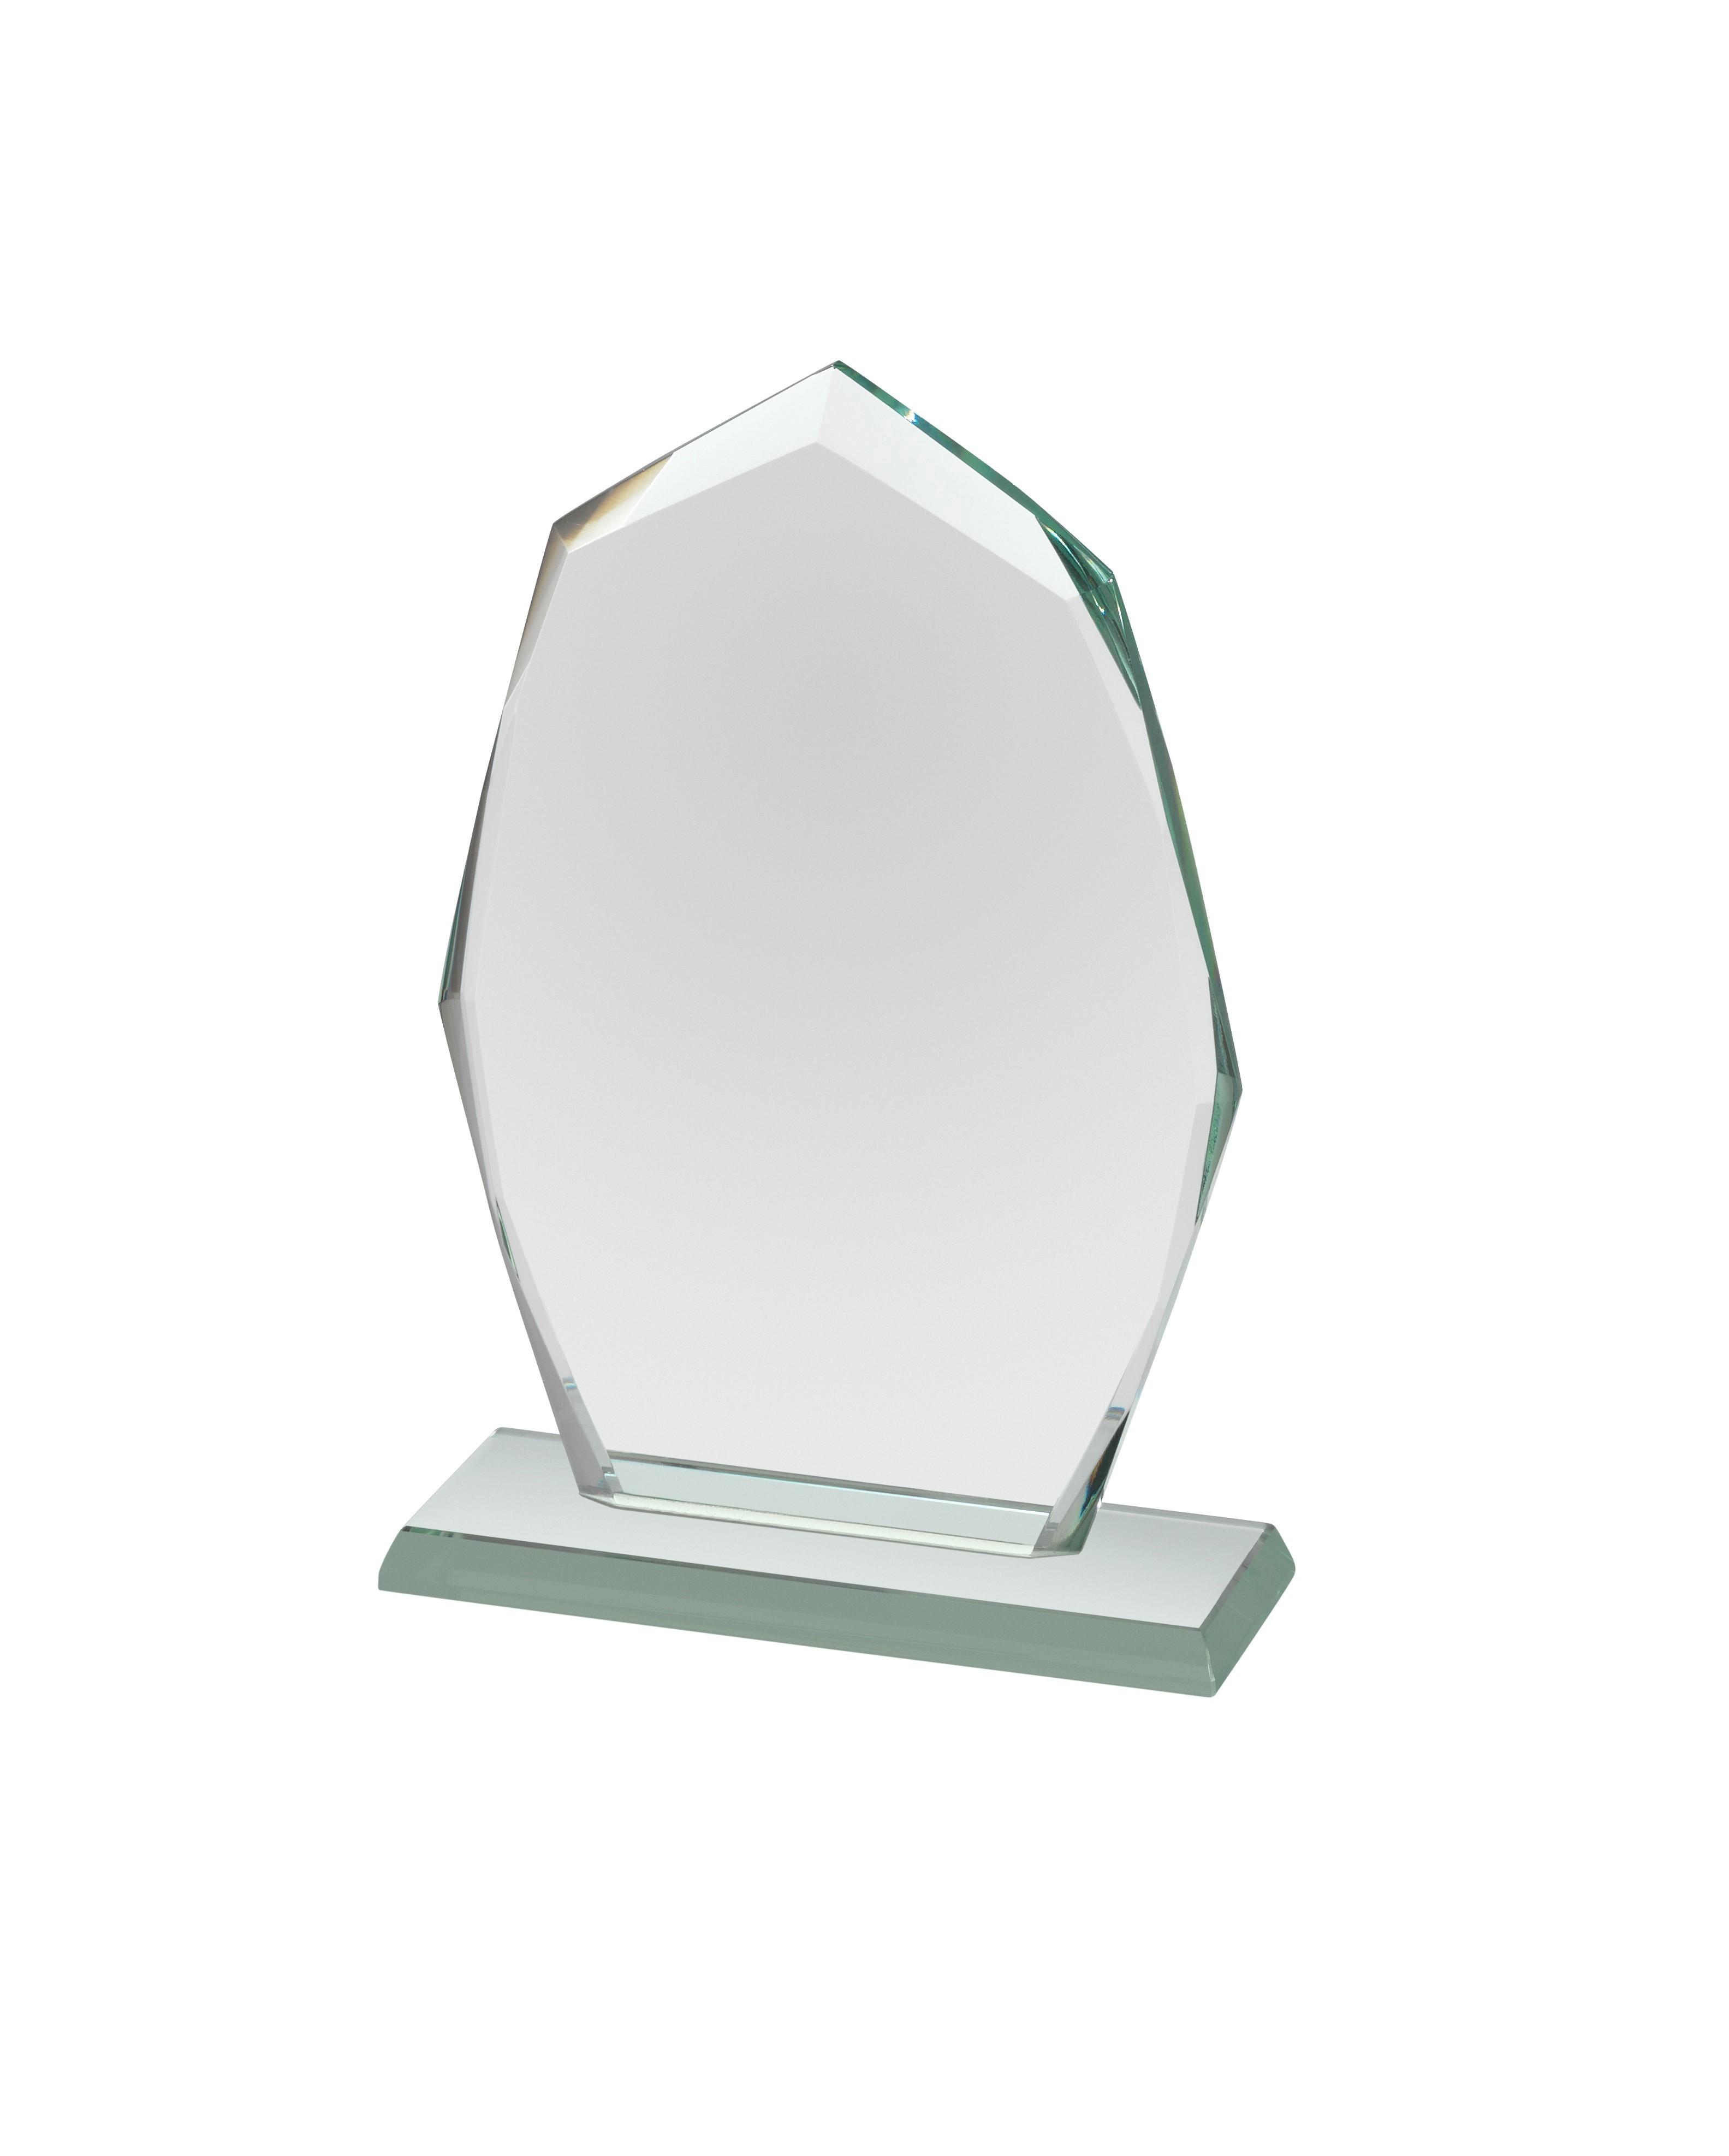 Mini Jade Glass Curved Award